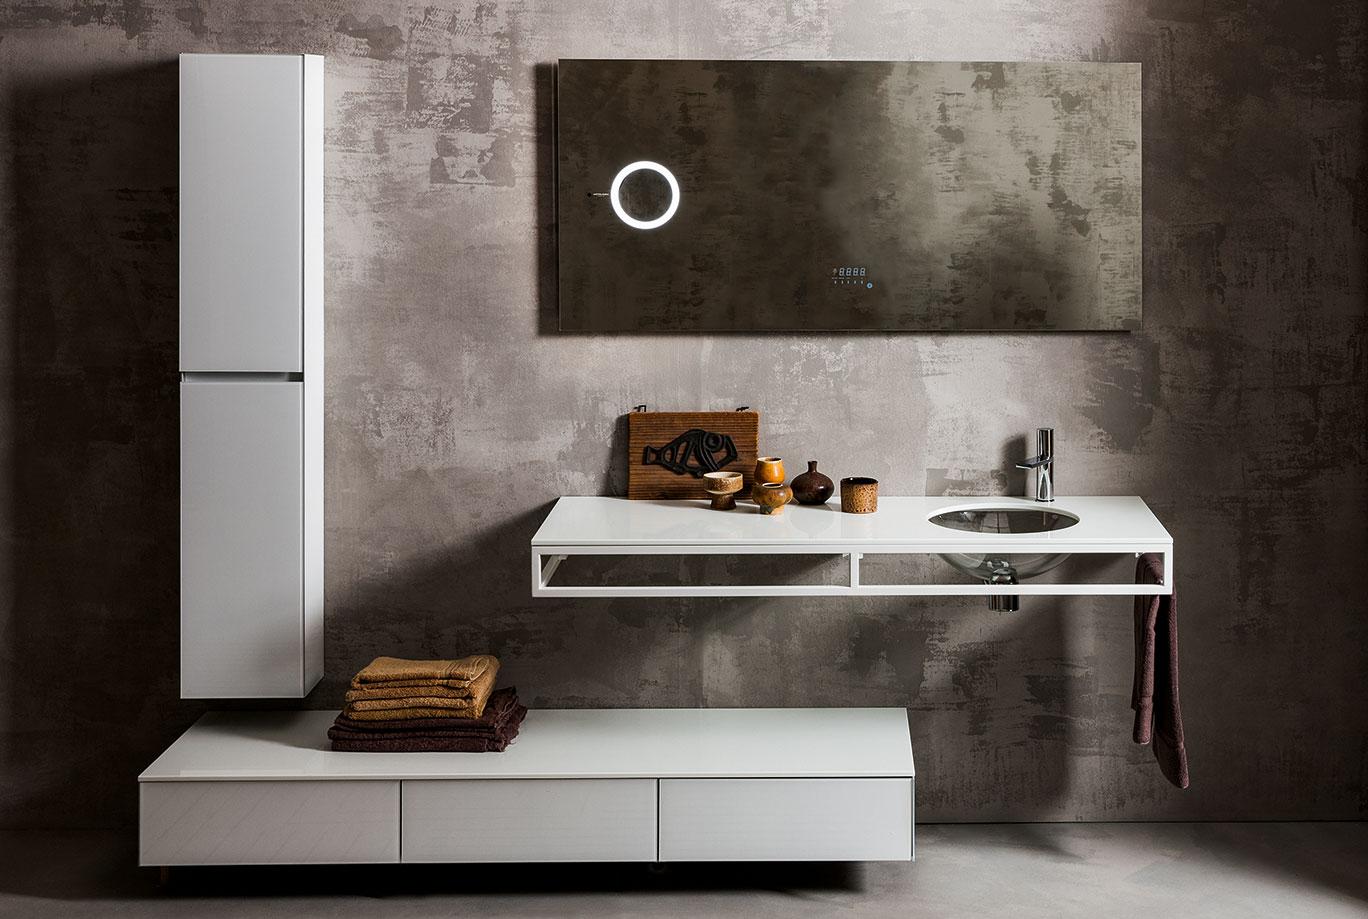 Home Reserve Furniture Bolla - Info - Salle de bain, Design, Ameublement de salle ...